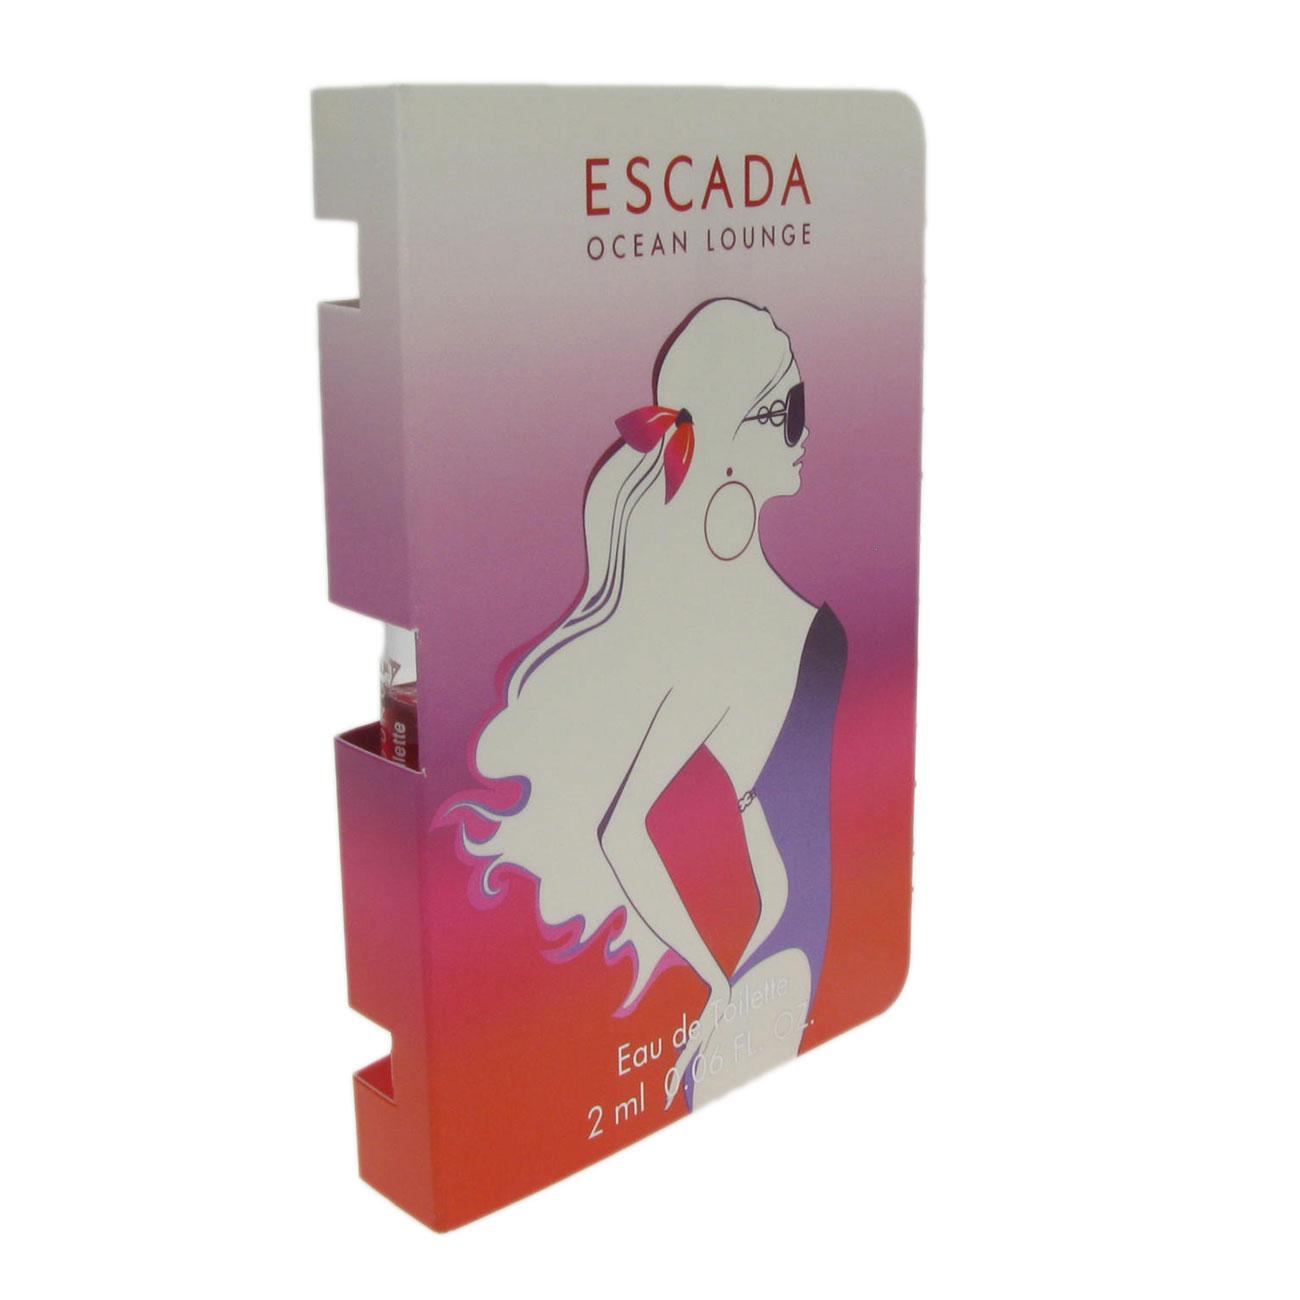 Escada Ocean Lounge Perfume Fragrance Spray For Women by Escada 2ml ...